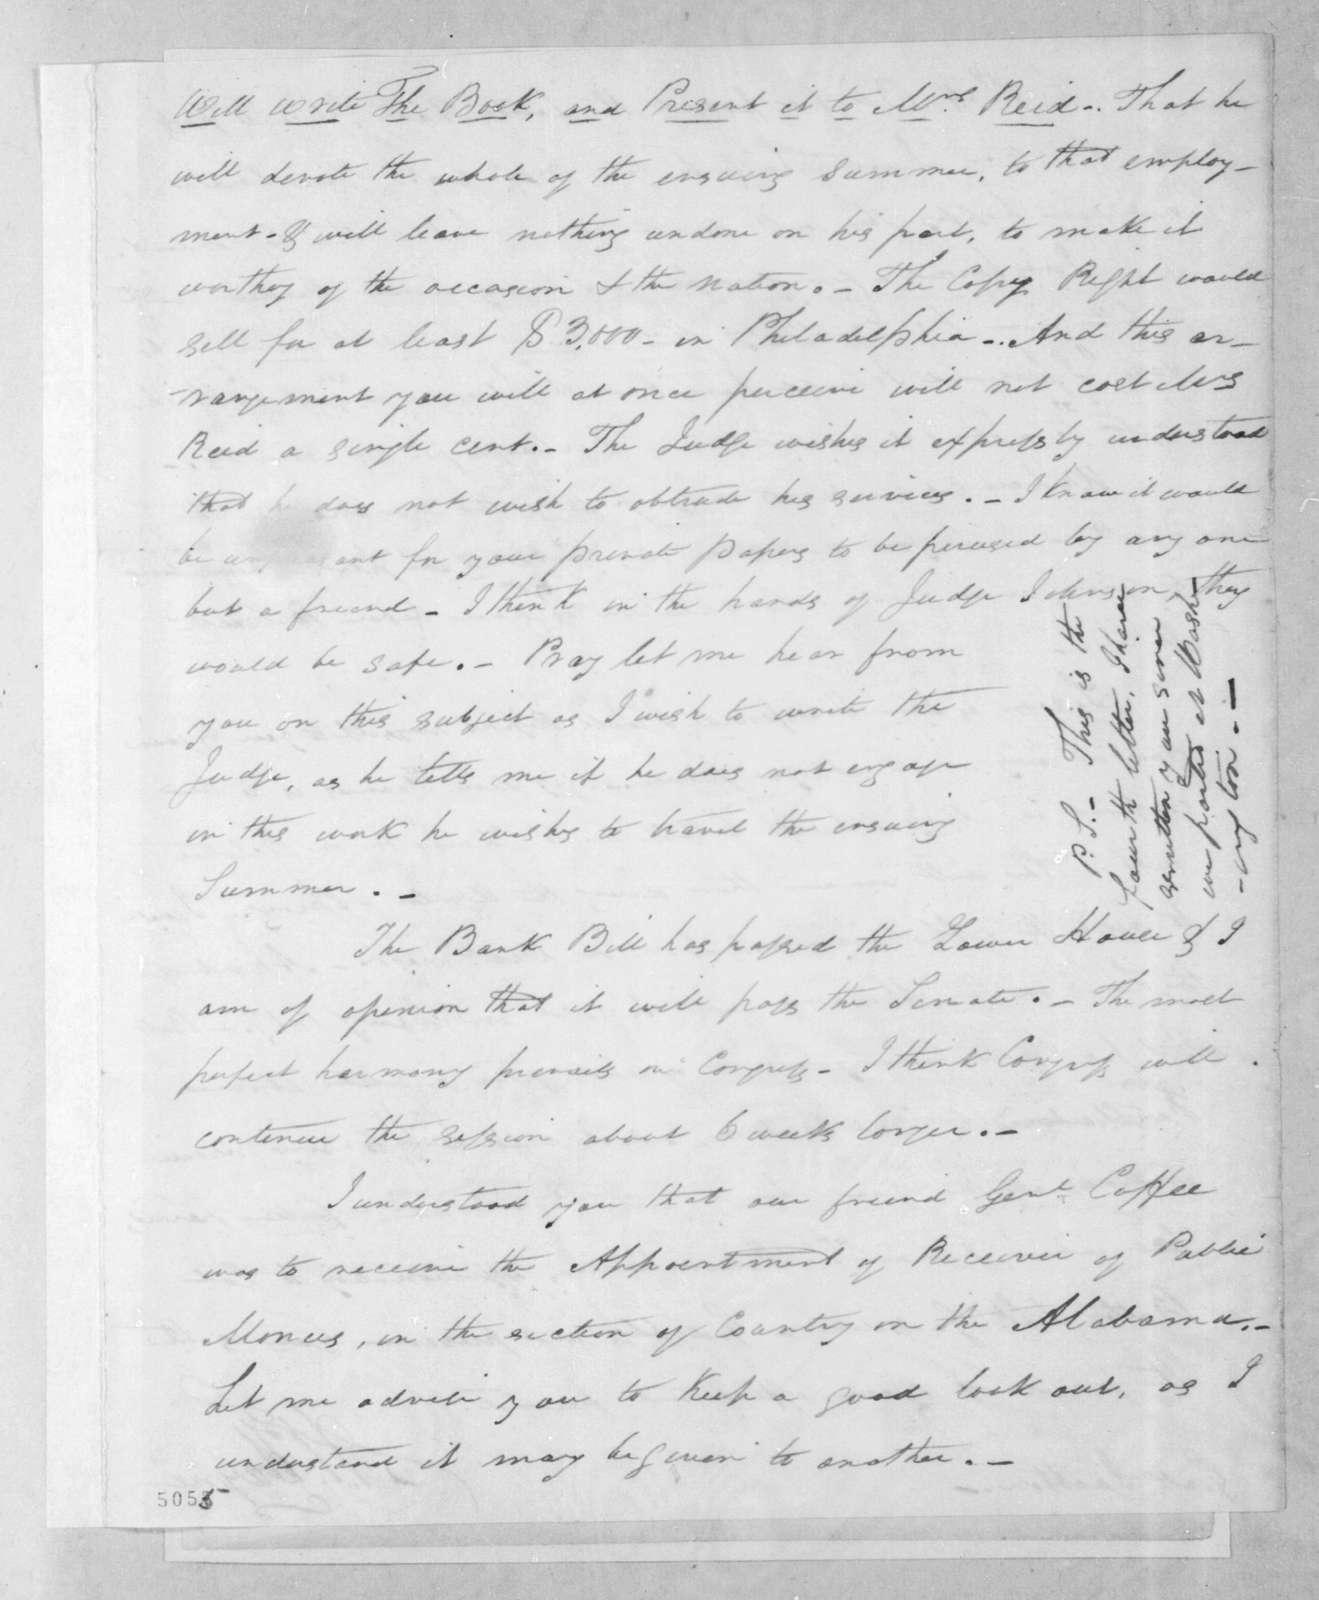 Arthur Peronneau Hayne to Andrew Jackson, March 27, 1816